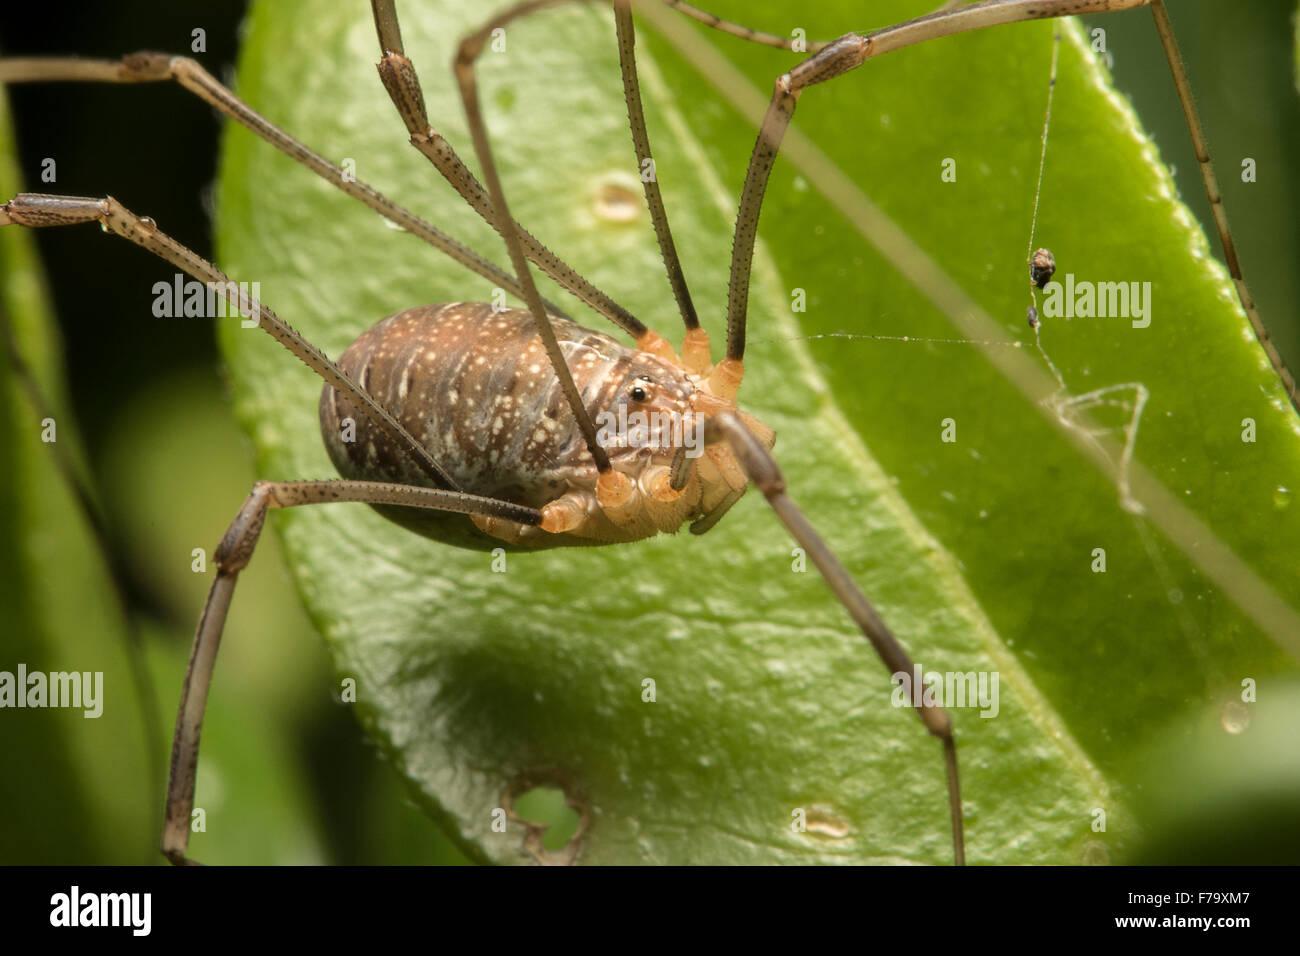 Harvestman arachnid sitting on a leaf, showing eye and body markings - Stock Image